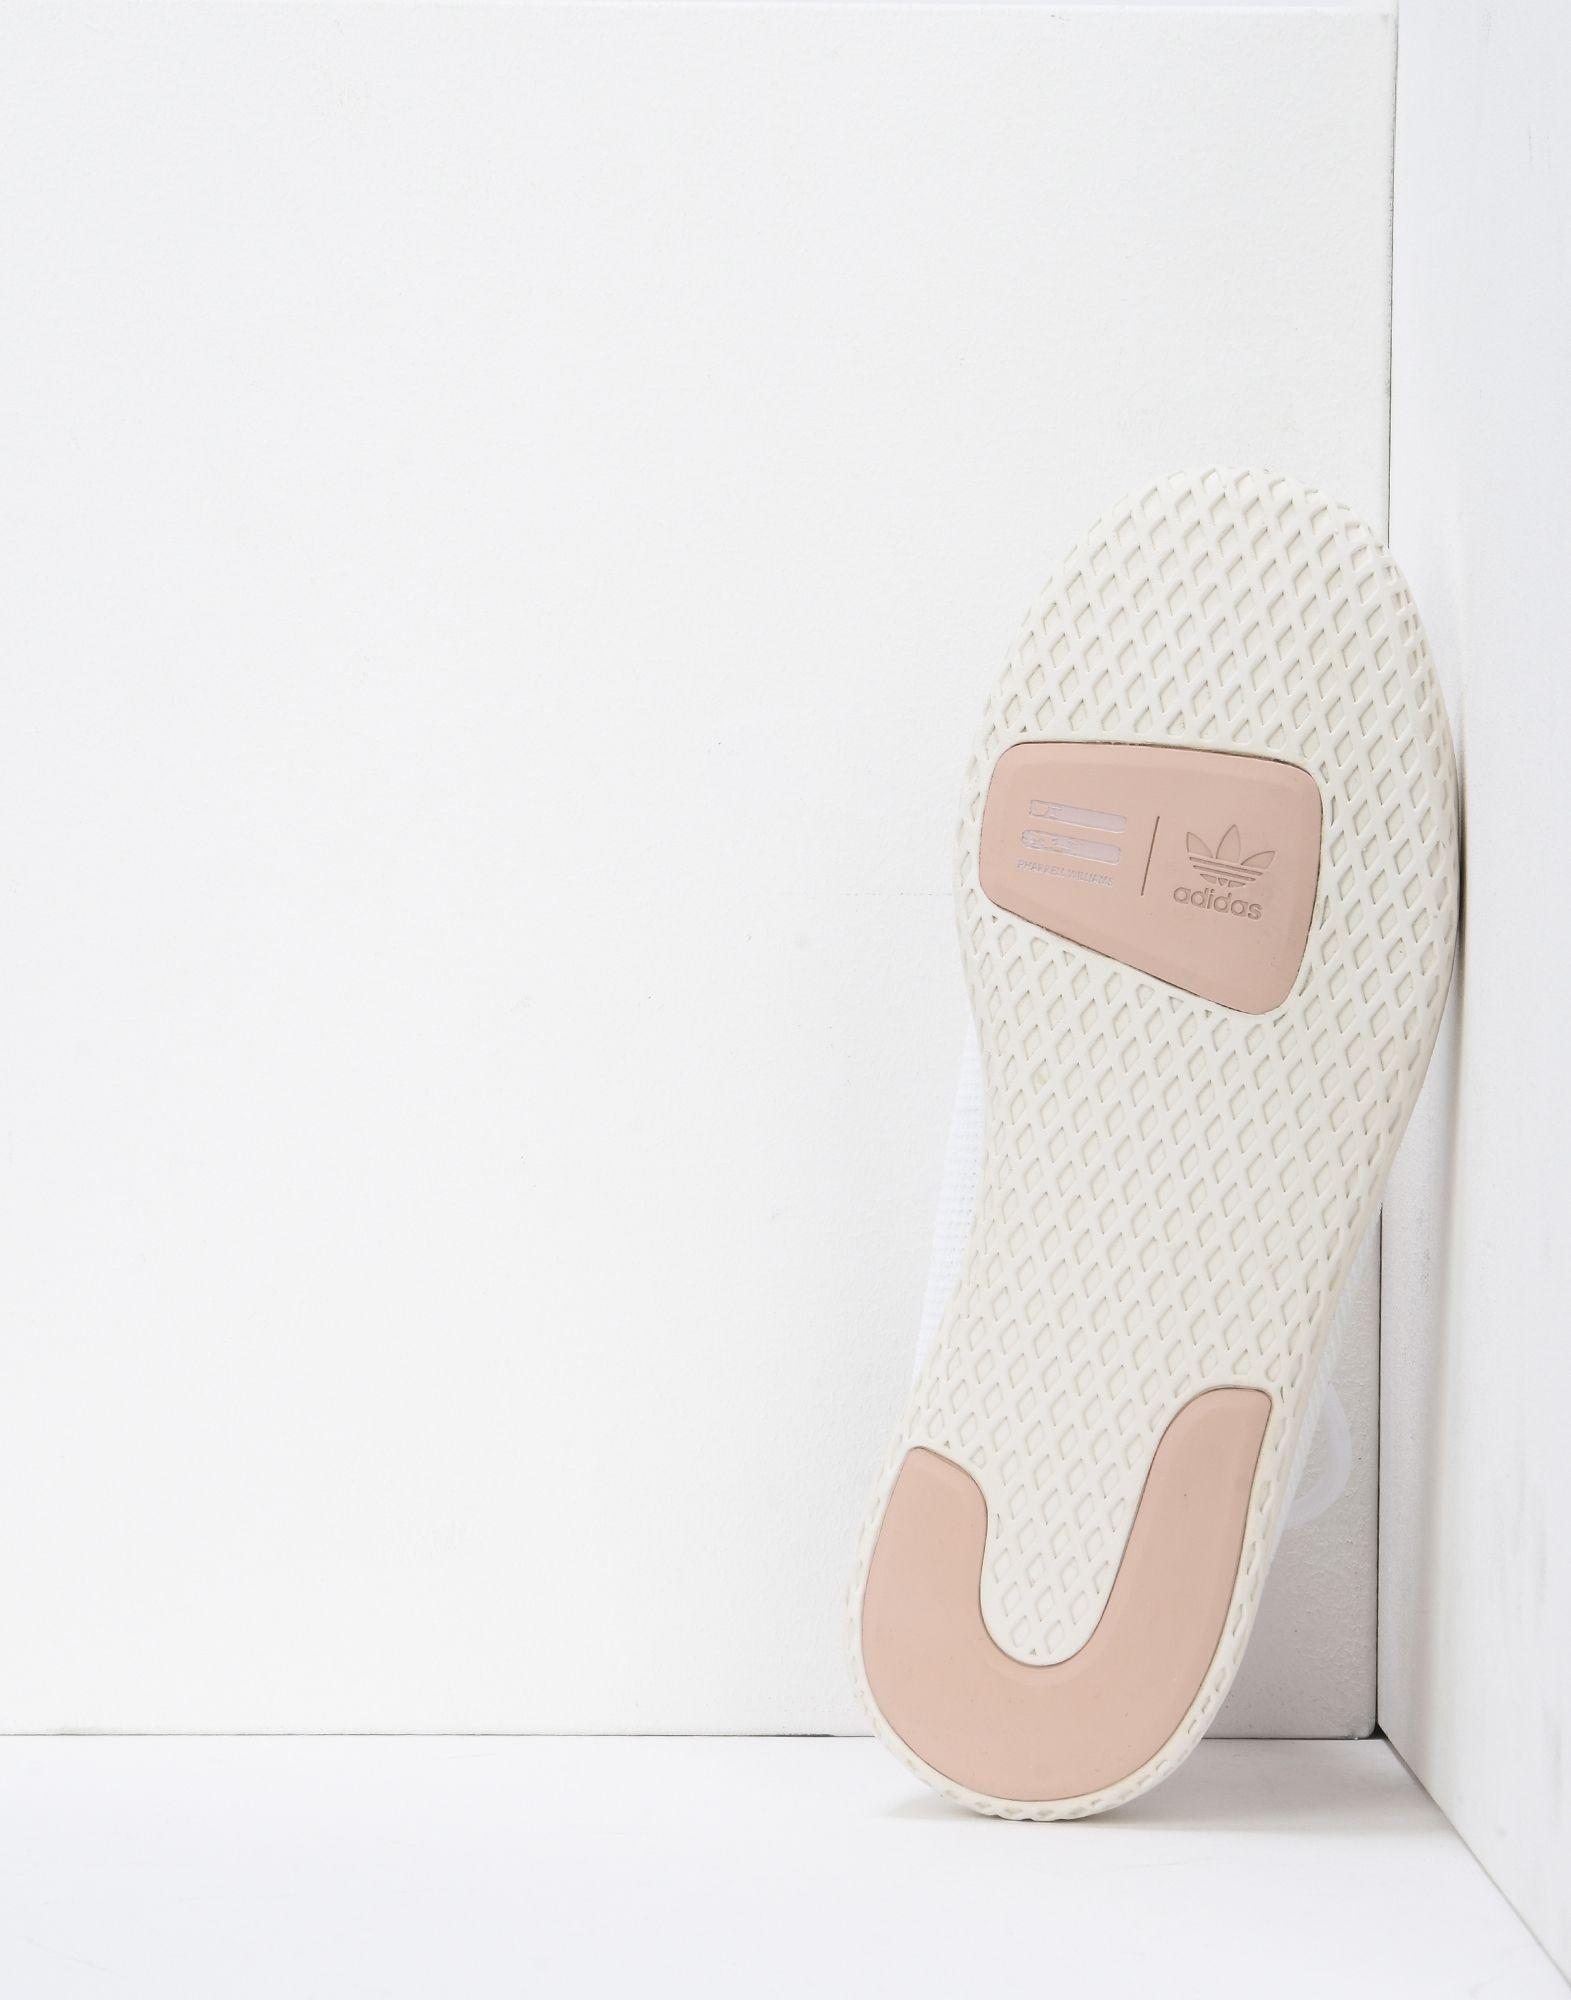 Adidas Originals By Pharrell Williams Pw Tennis Hu  Qualität 11459432NS Gute Qualität  beliebte Schuhe 262946